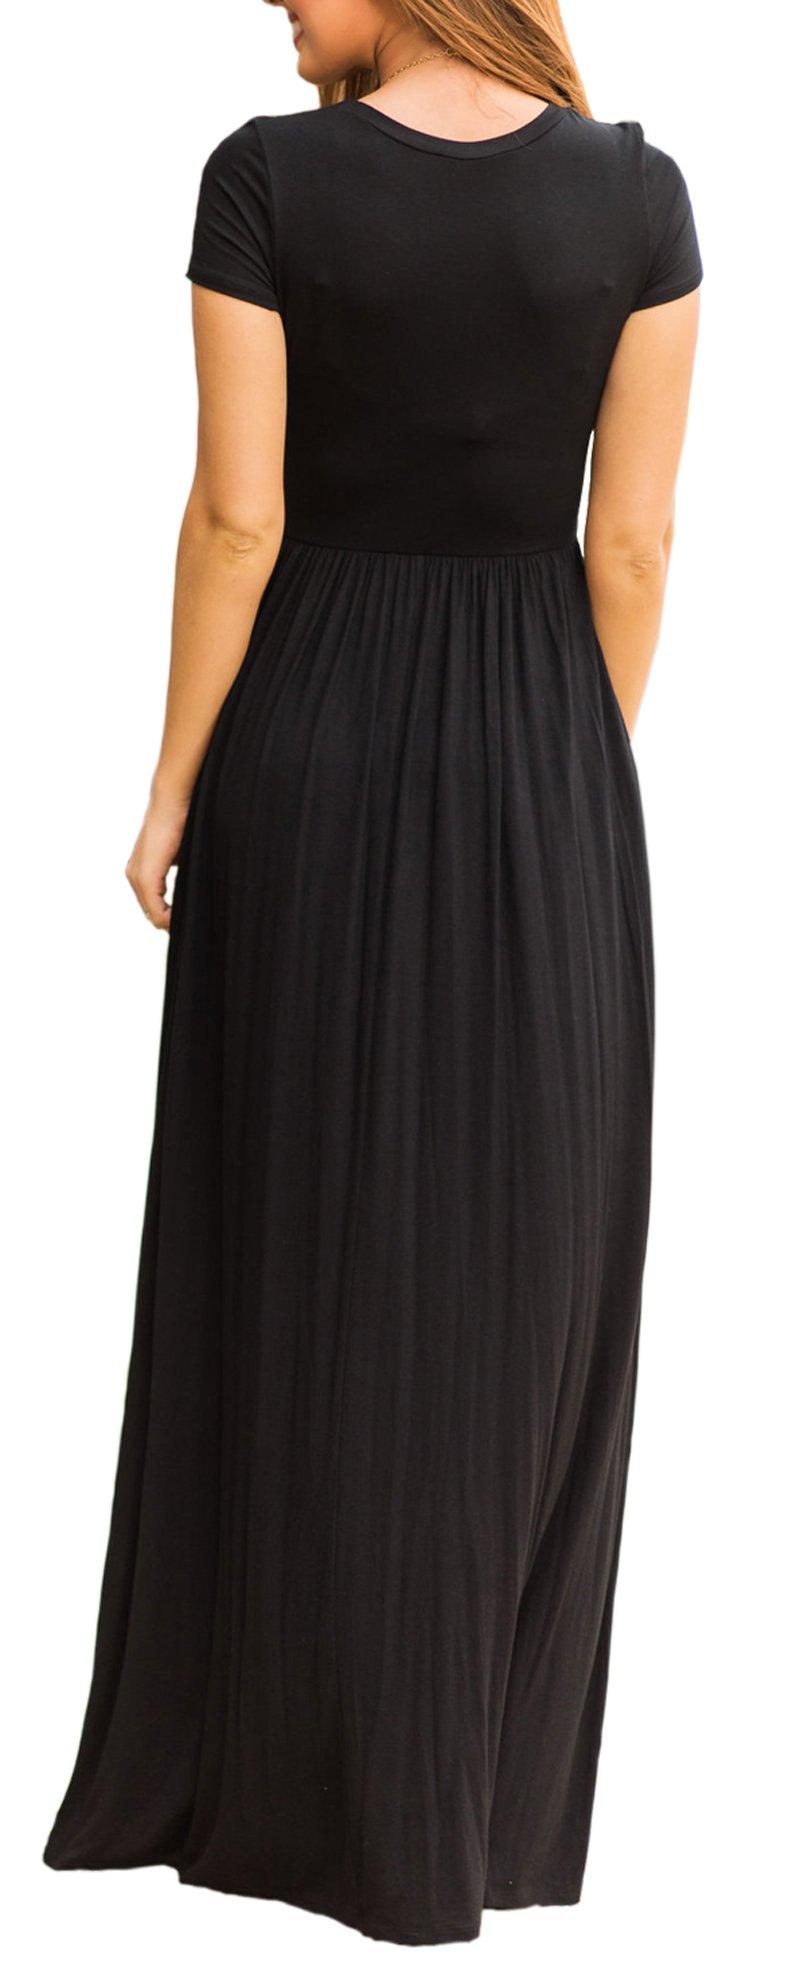 Viishow-Womens-Short-Sleeve-Loose-Plain-Maxi-Dresses-Casual-Long-Dresses-with-Pockets